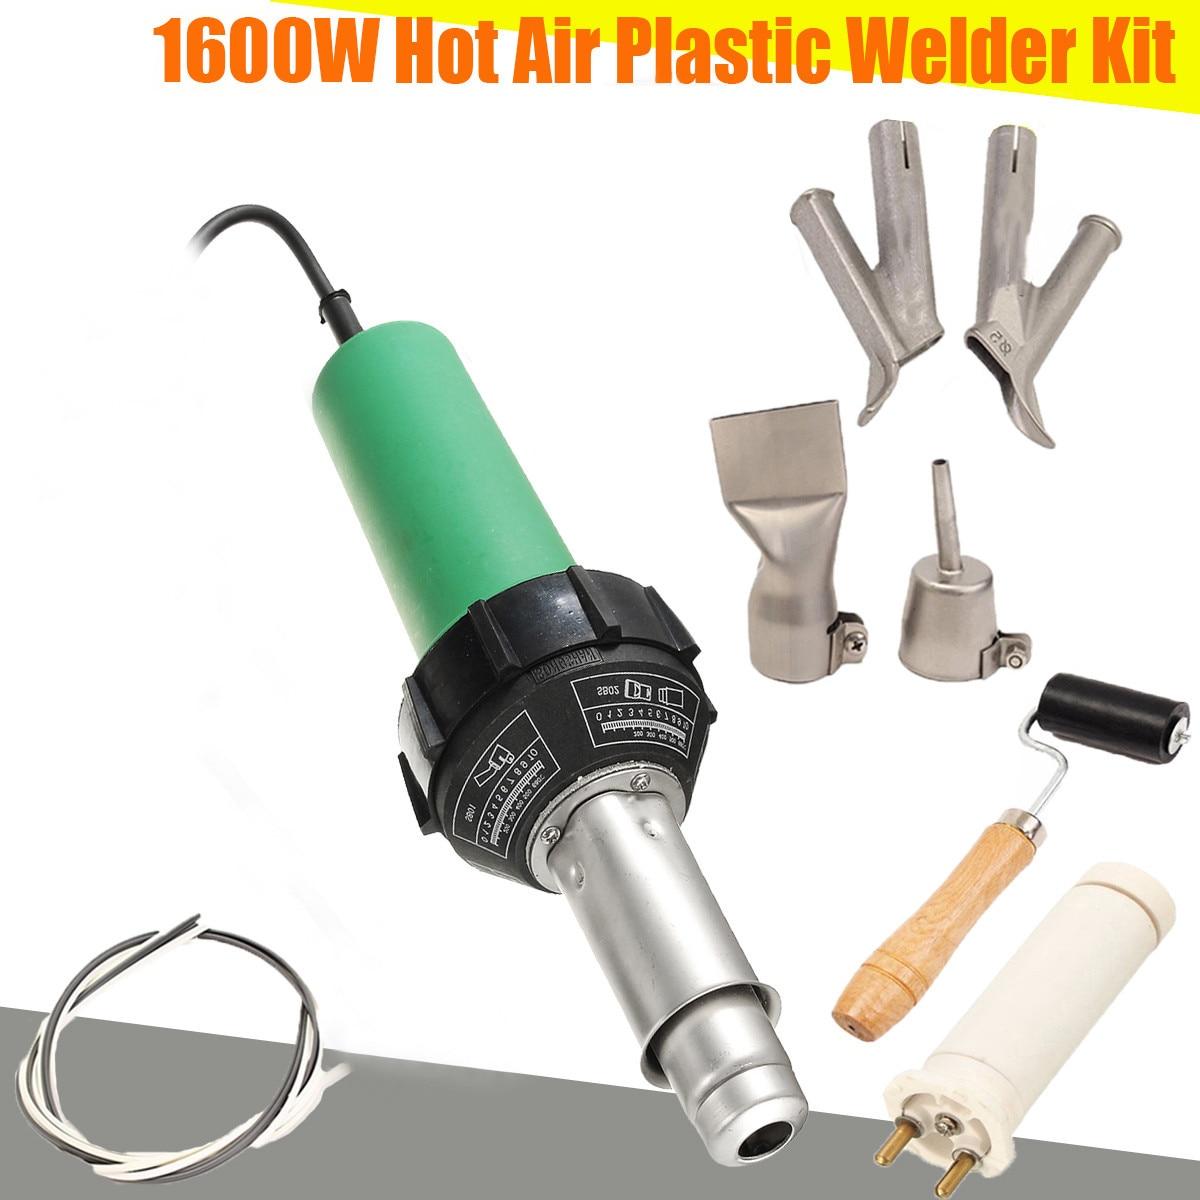 220V 1600W 3000Pa البلاستيك المتكاملة لحام الهواء الساخن لحام الشعلة G الامم المتحدة التدفئة النواة مجموعة + 2 قطعة سرعة فوهة + الأسطوانة